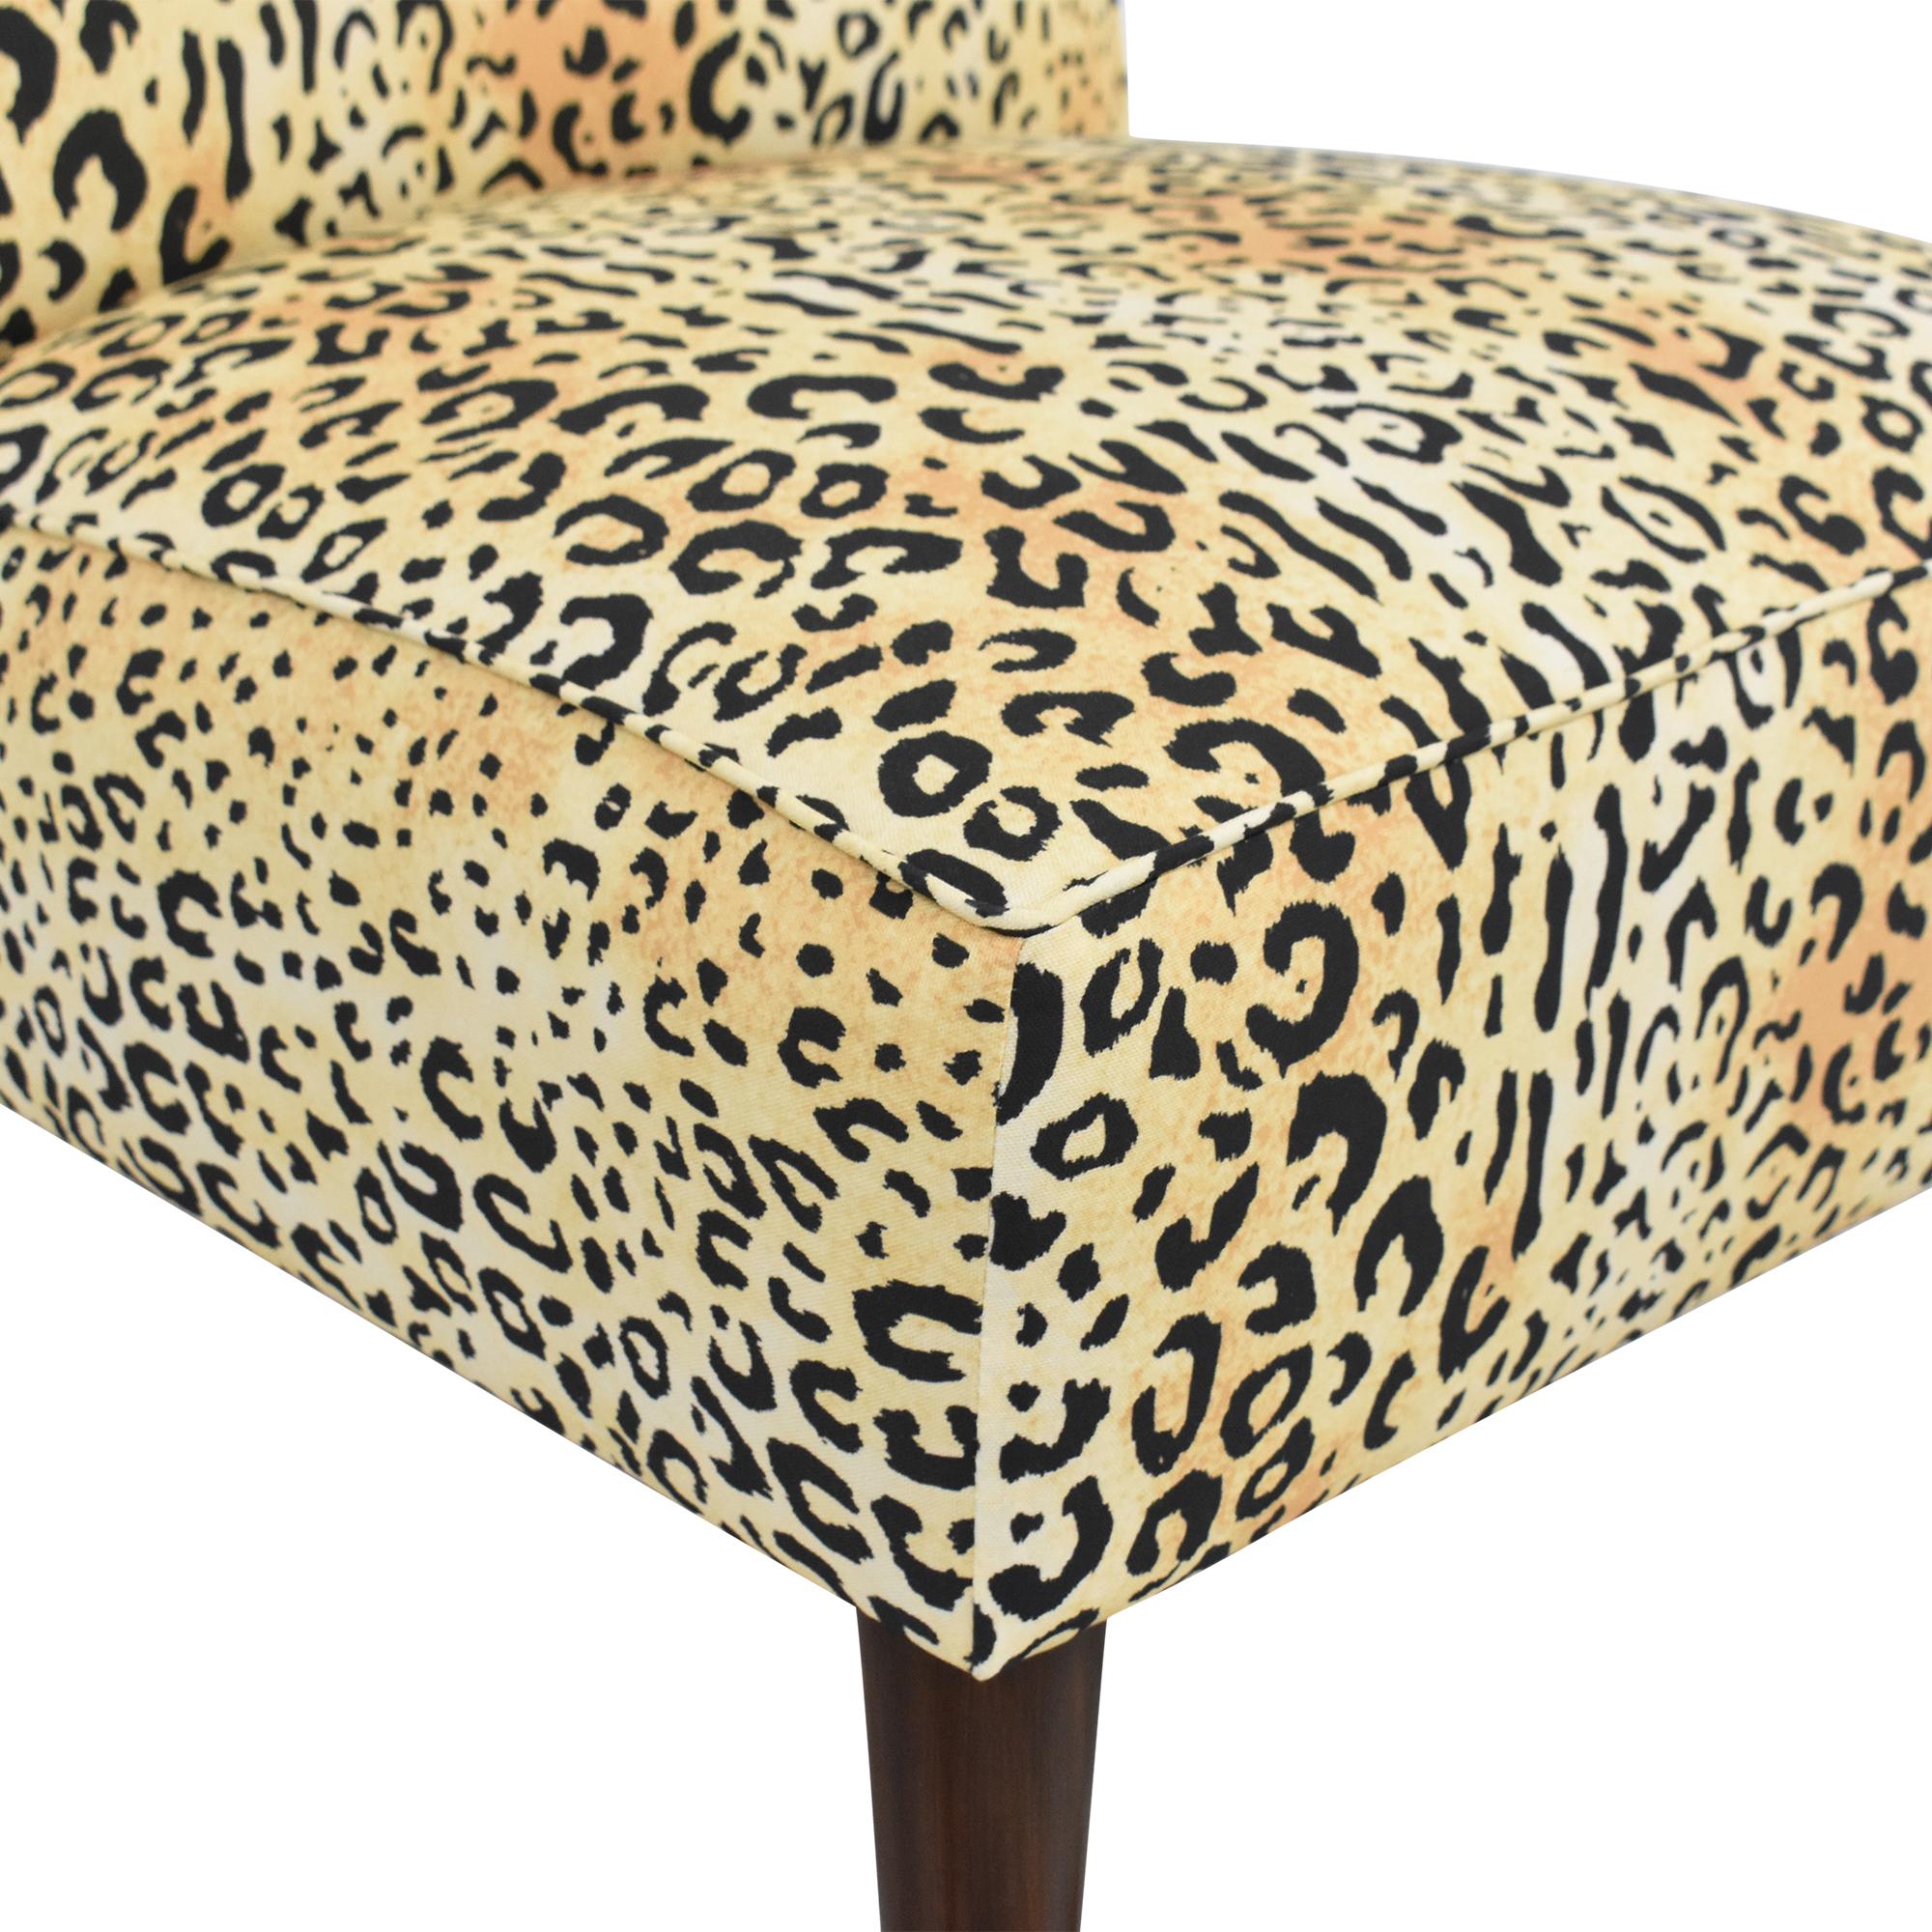 The Inside The Inside Slipper Chair on sale